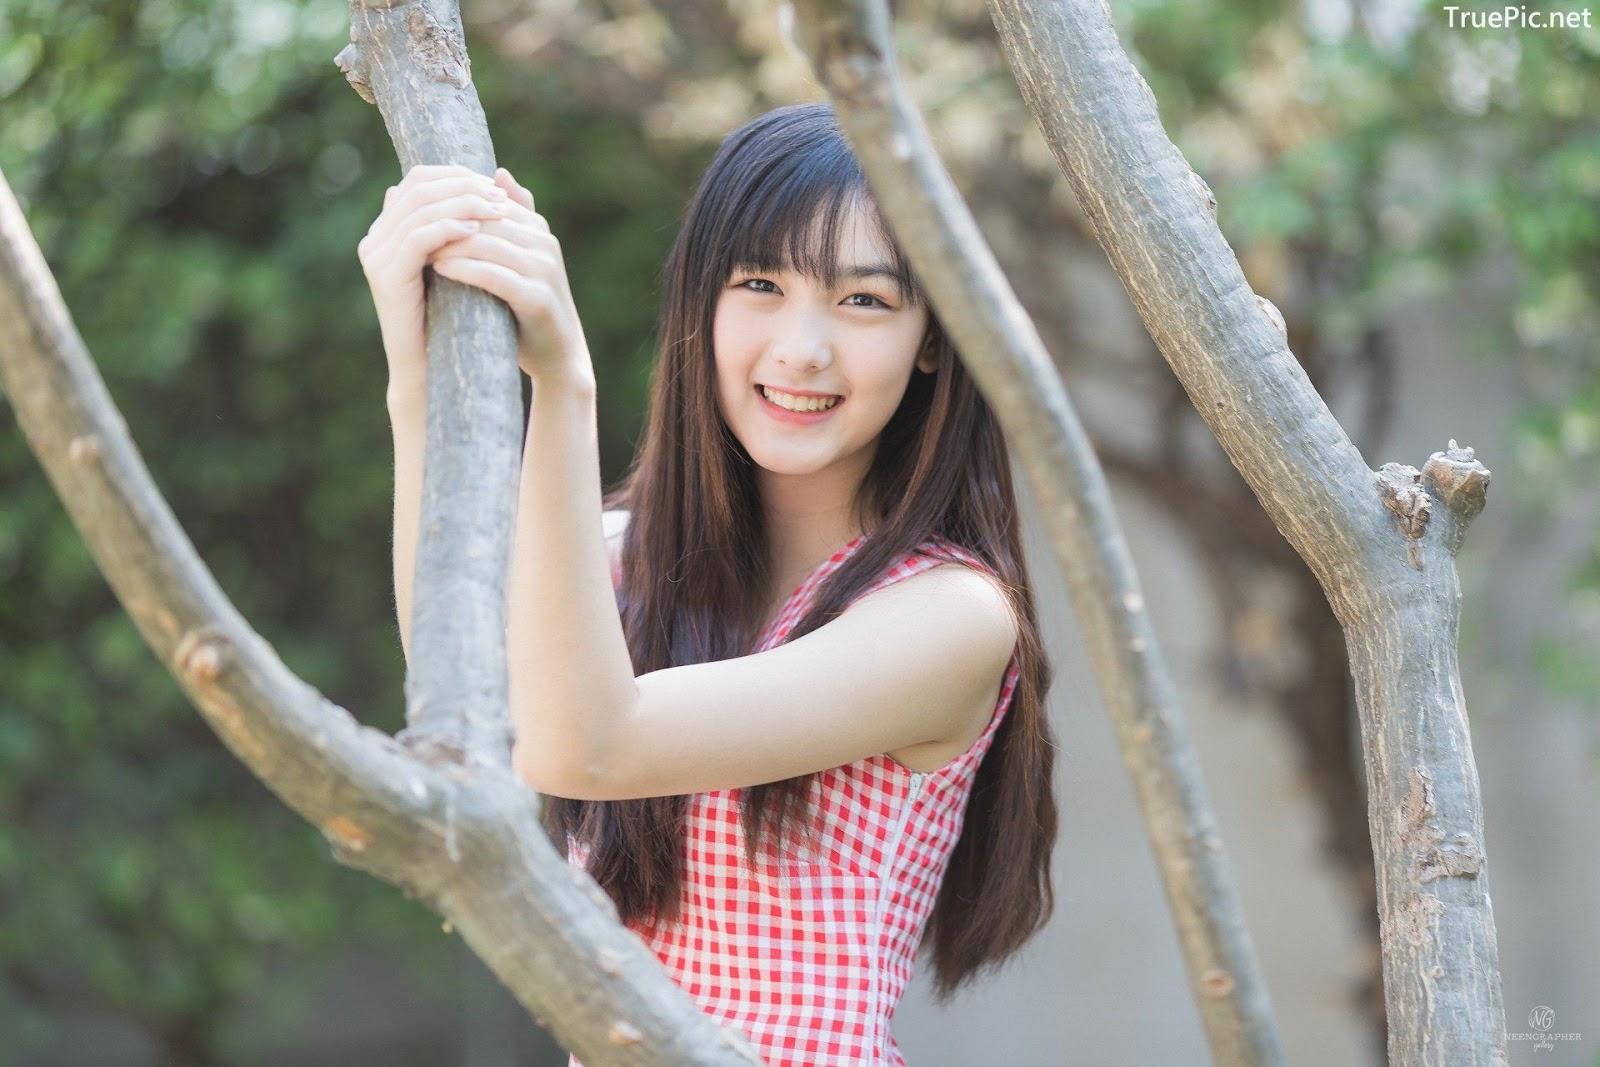 Image-Thailand-Cute-Model-Emma-Panisara–Album-Emma-Bright-Sunday-TruePic.net- Picture-18